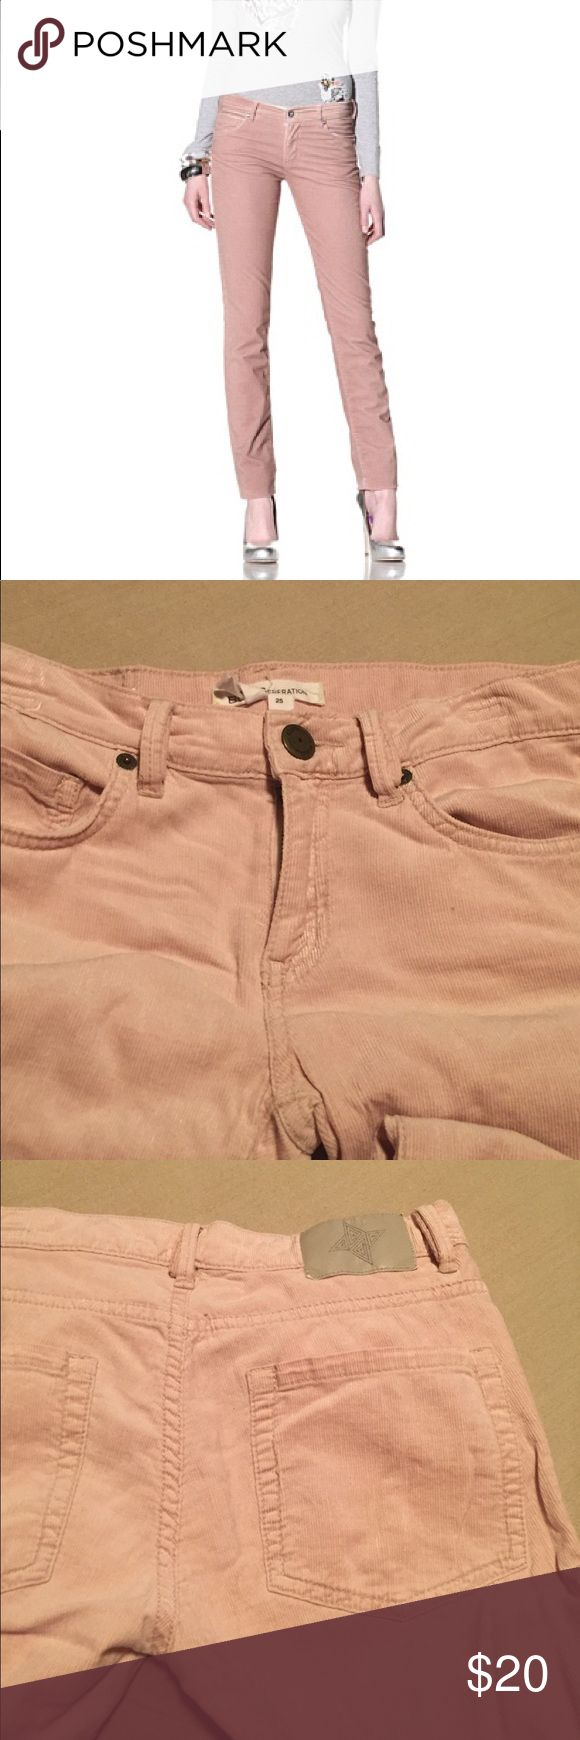 Jessica Simpson Ballet Slippers corduroy pants Soft pink skinny corduroy pants Jessica Simpson Pants Skinny